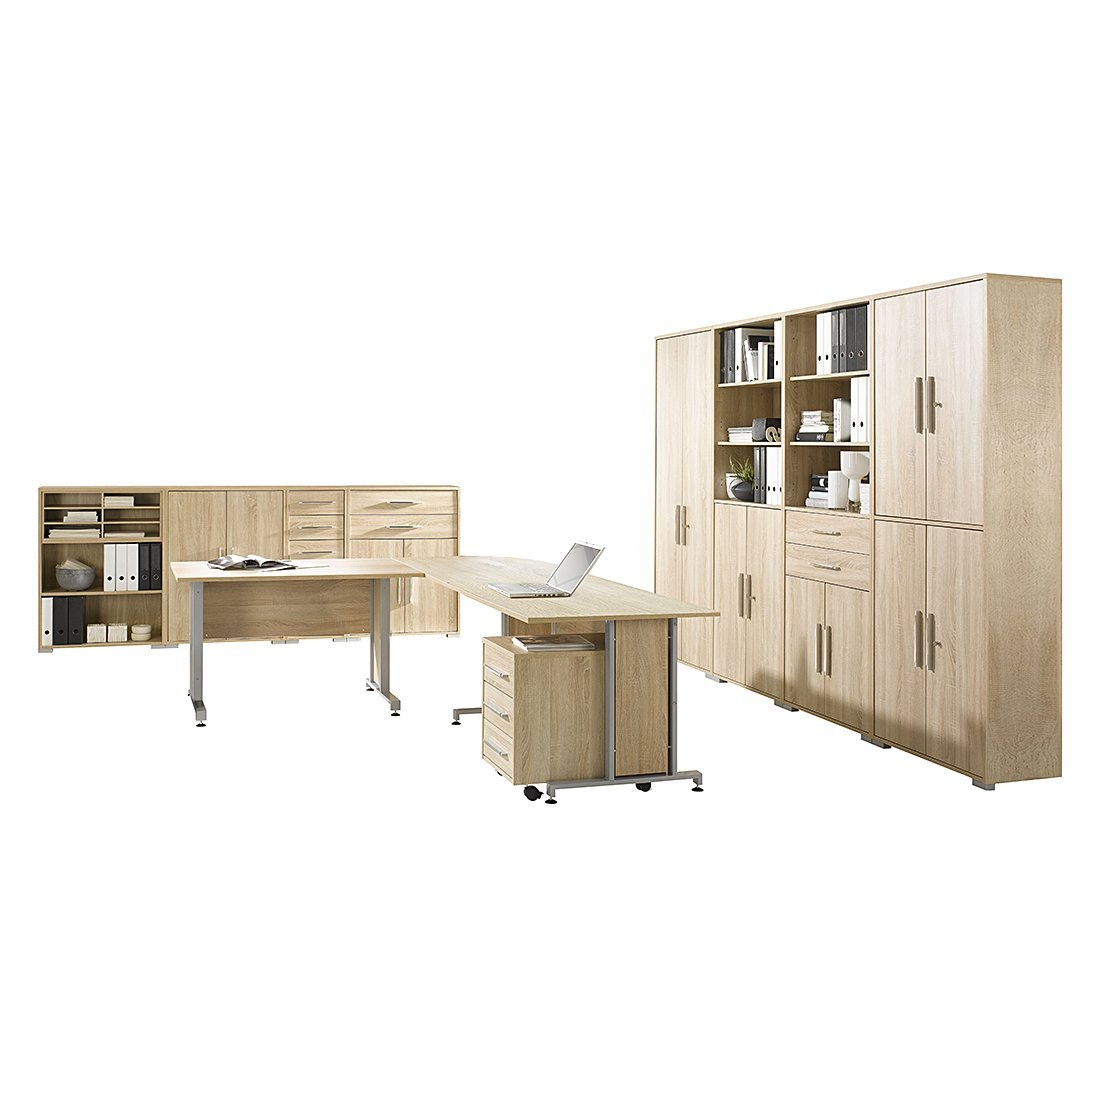 MAJA-Möbel 1204 5525 Büroprogramm SYSTEM, Sonoma-Eiche-Nachbildung